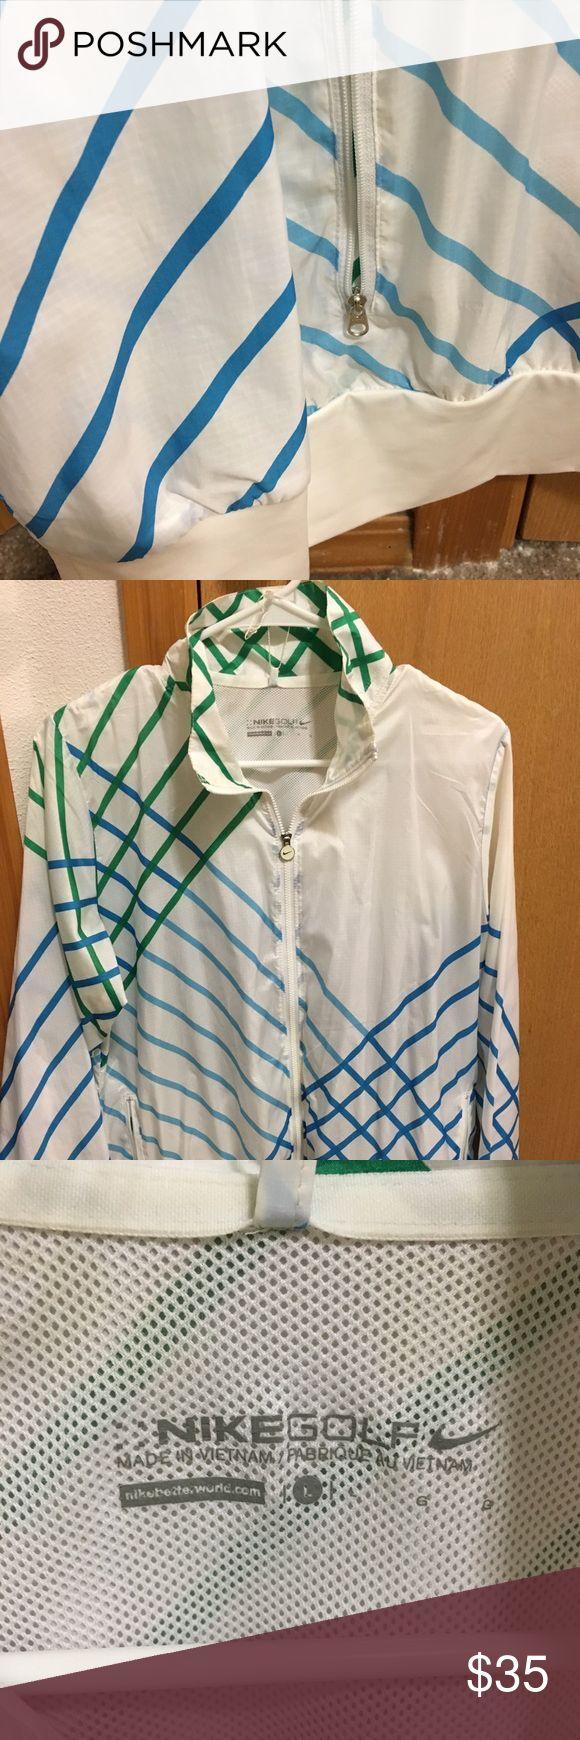 Nike golf jacket Gently used golf jacket. White, green and blue. Duel zipper. Zipper pockets. Light material. Nike Jackets & Coats